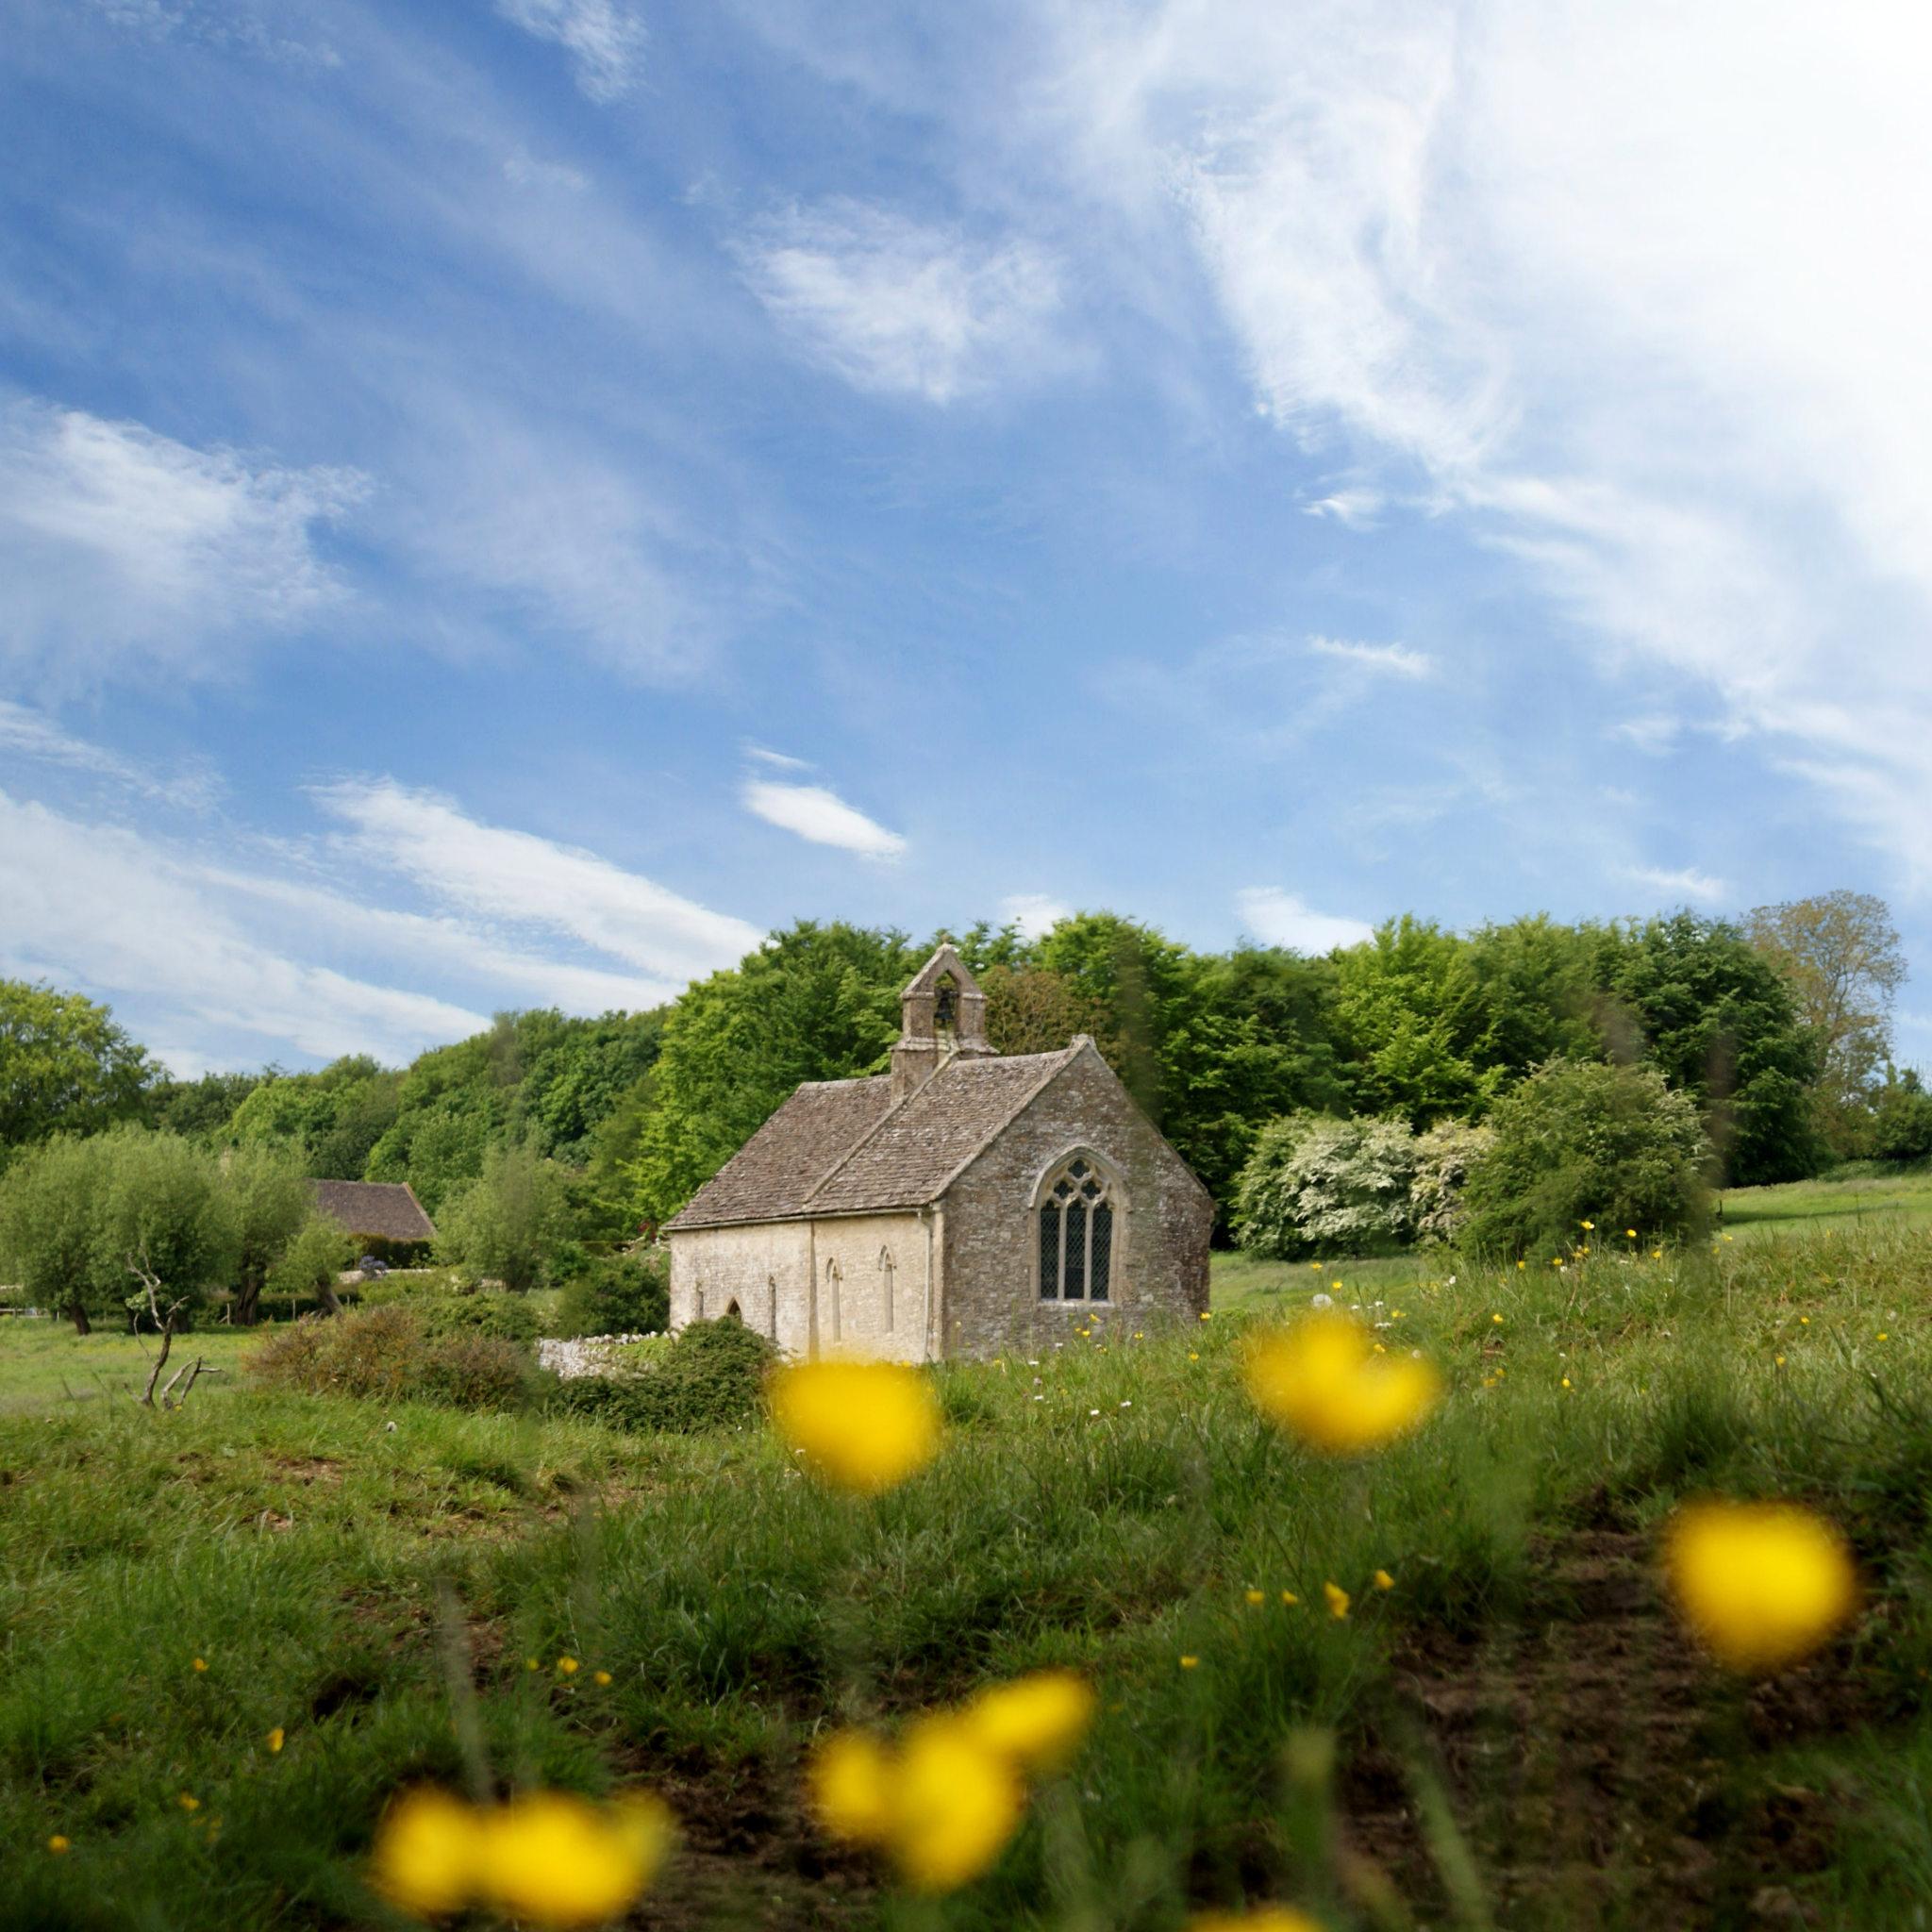 Swinbrook To Burford Walk through The Windrush Valley via St Oswalds Church, Widford